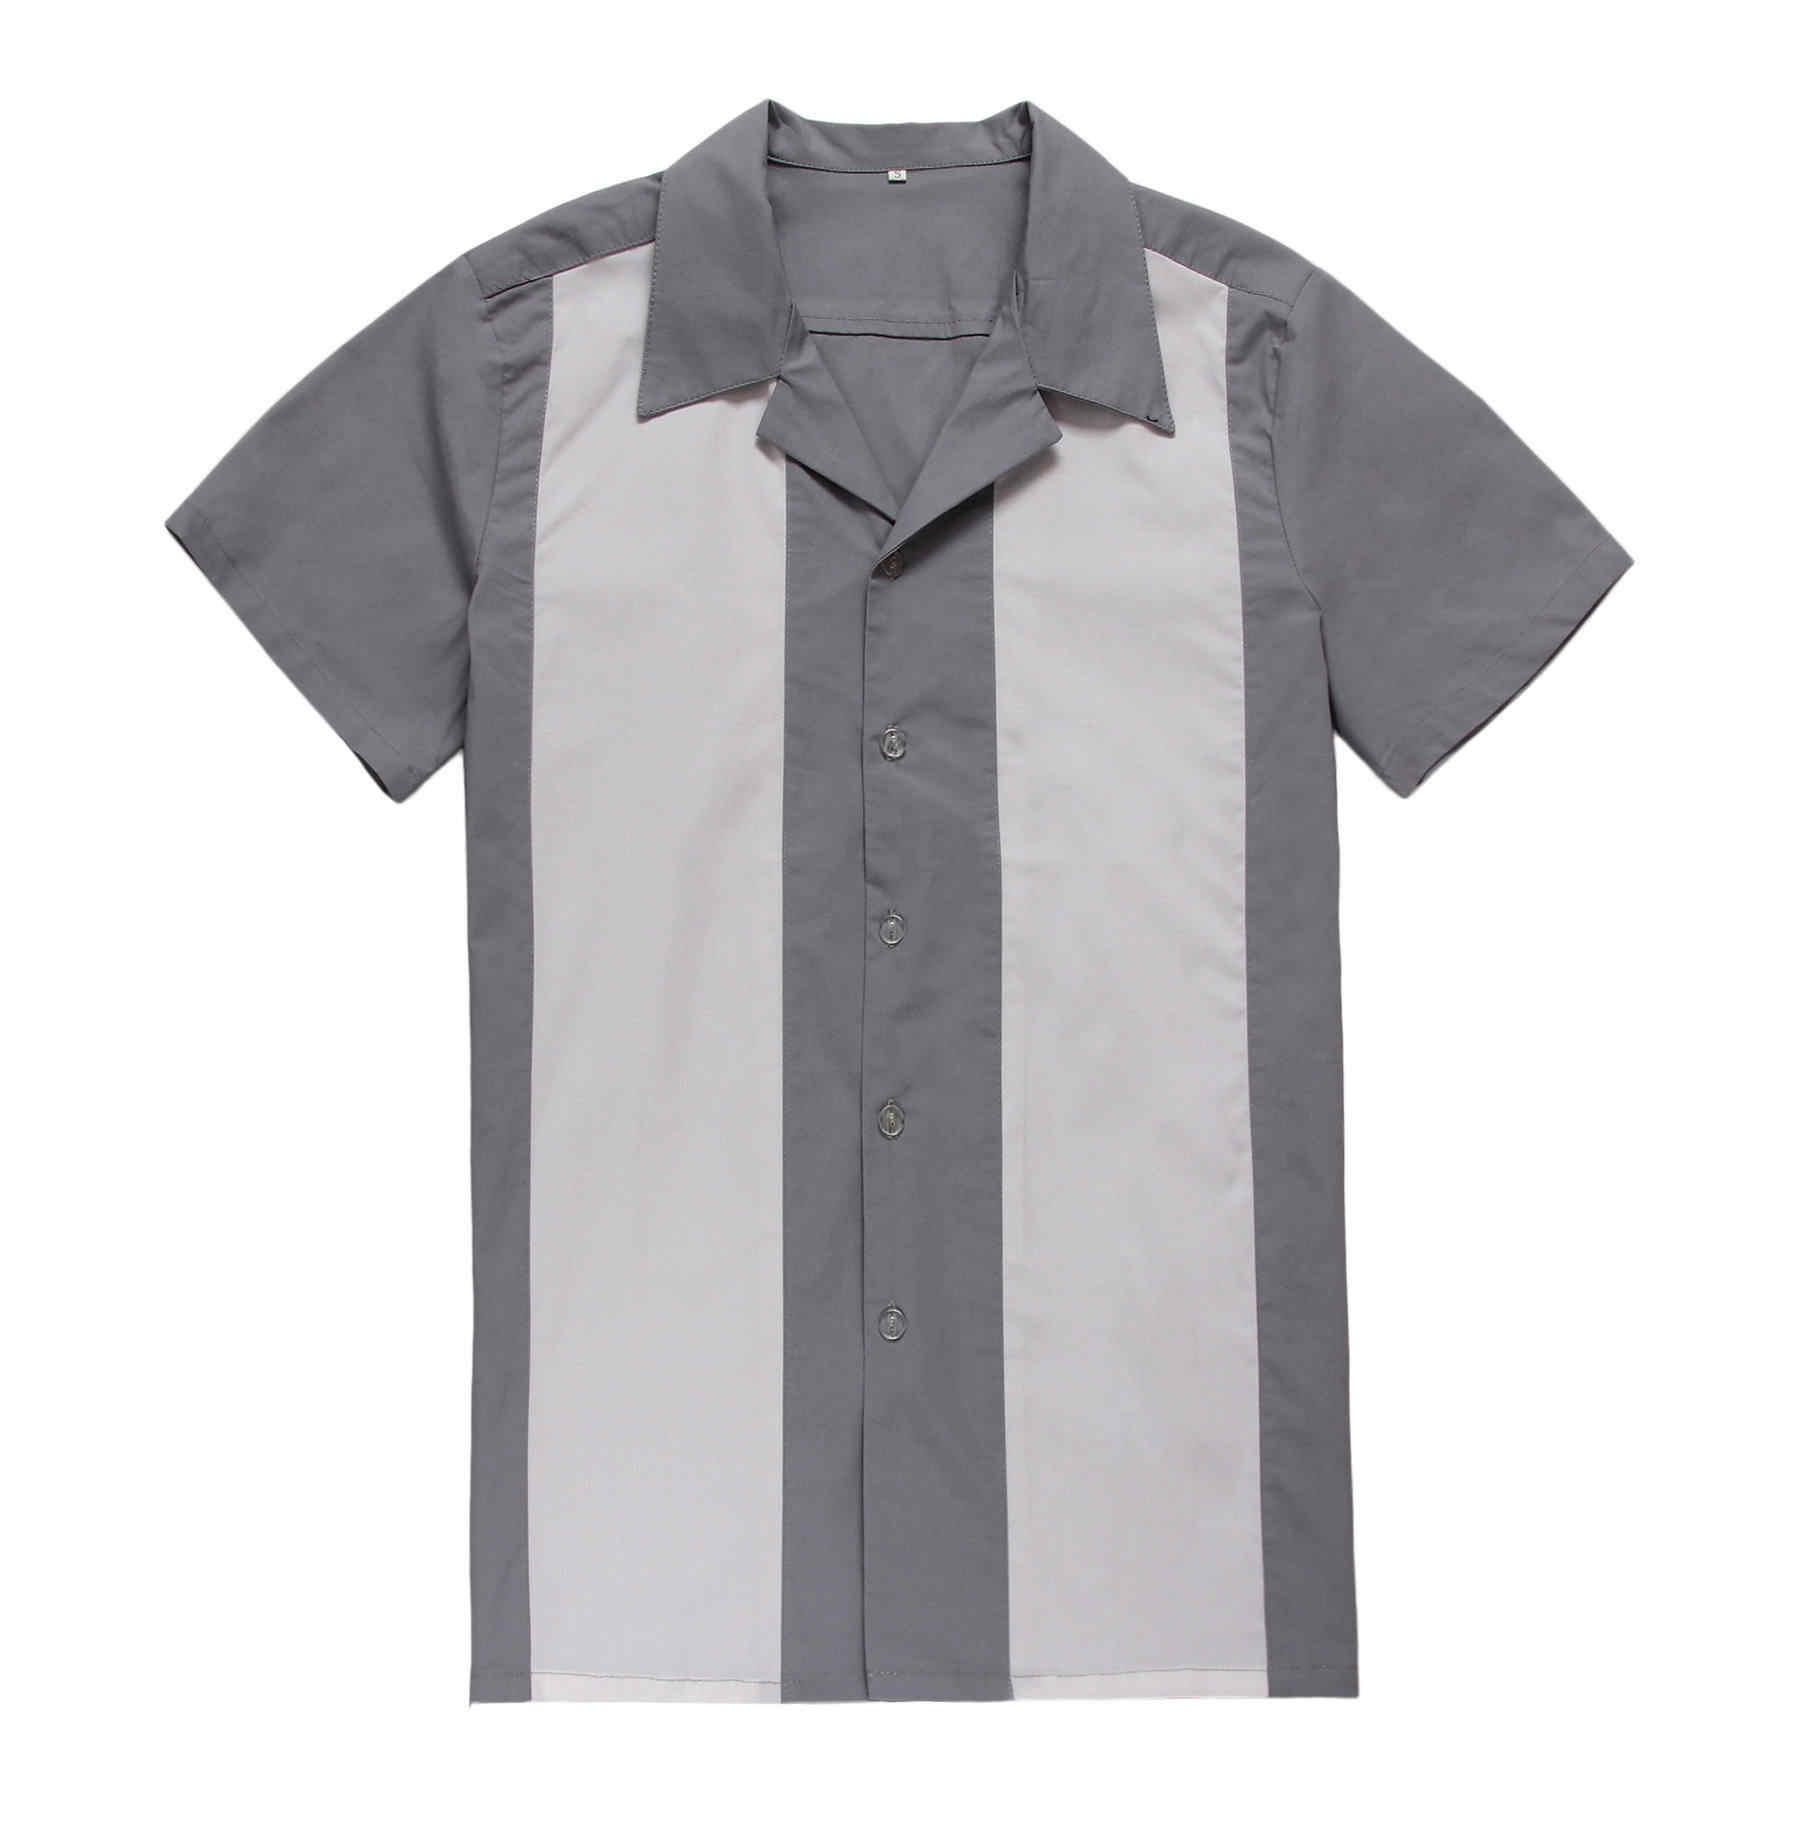 3feb0b8e1 CandowLook Online Shopping Men Cotton Short Sleeve Stylish American Vintage  Casual Designs Rockabilly Panel Shirts for